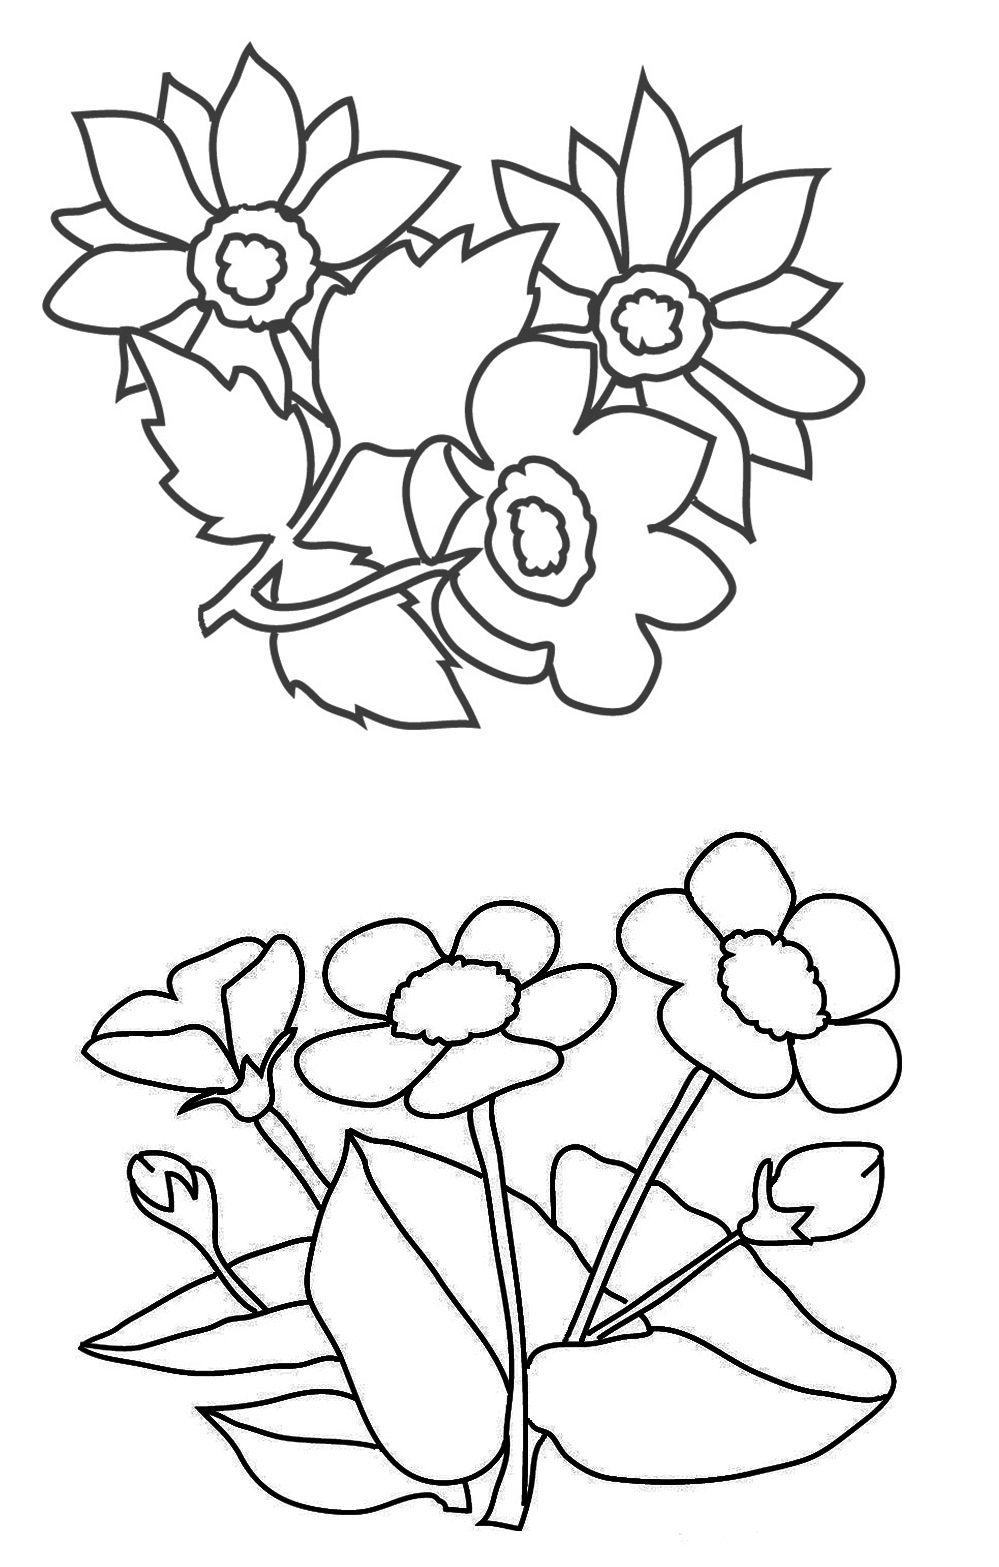 999x1567 Amazing Cochlospermum Vitifolium Or Buttercup Tree Coloring Page